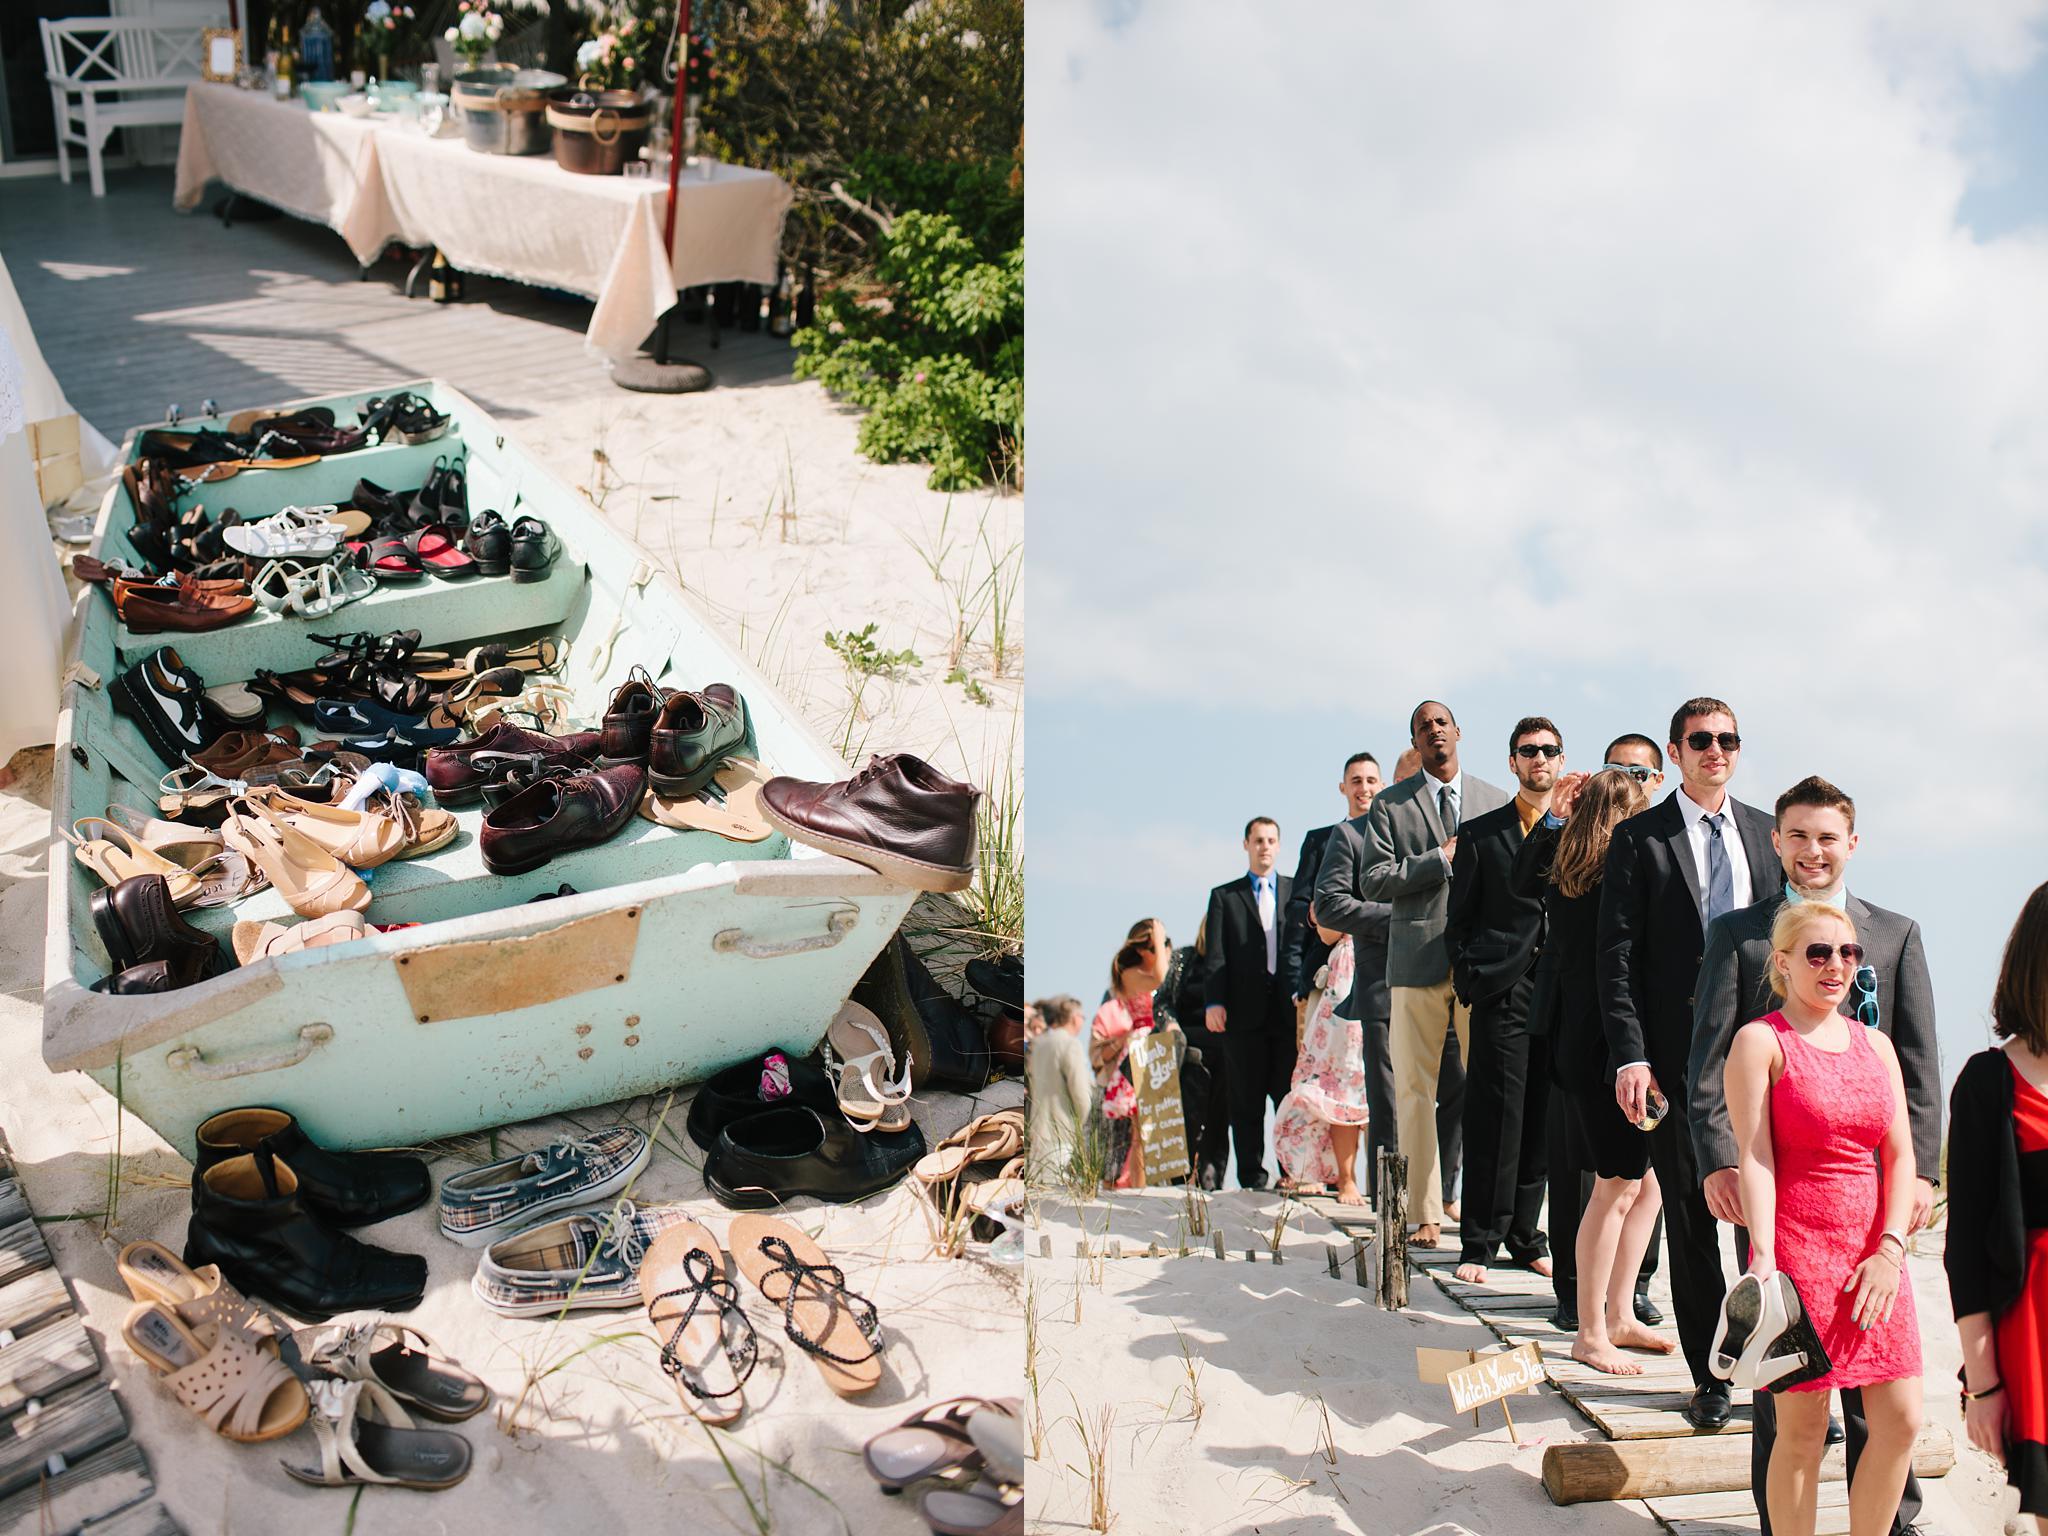 brant_beach_yacht_club_wedding_long_beach_island_nj_wedding_photographer_518.jpg